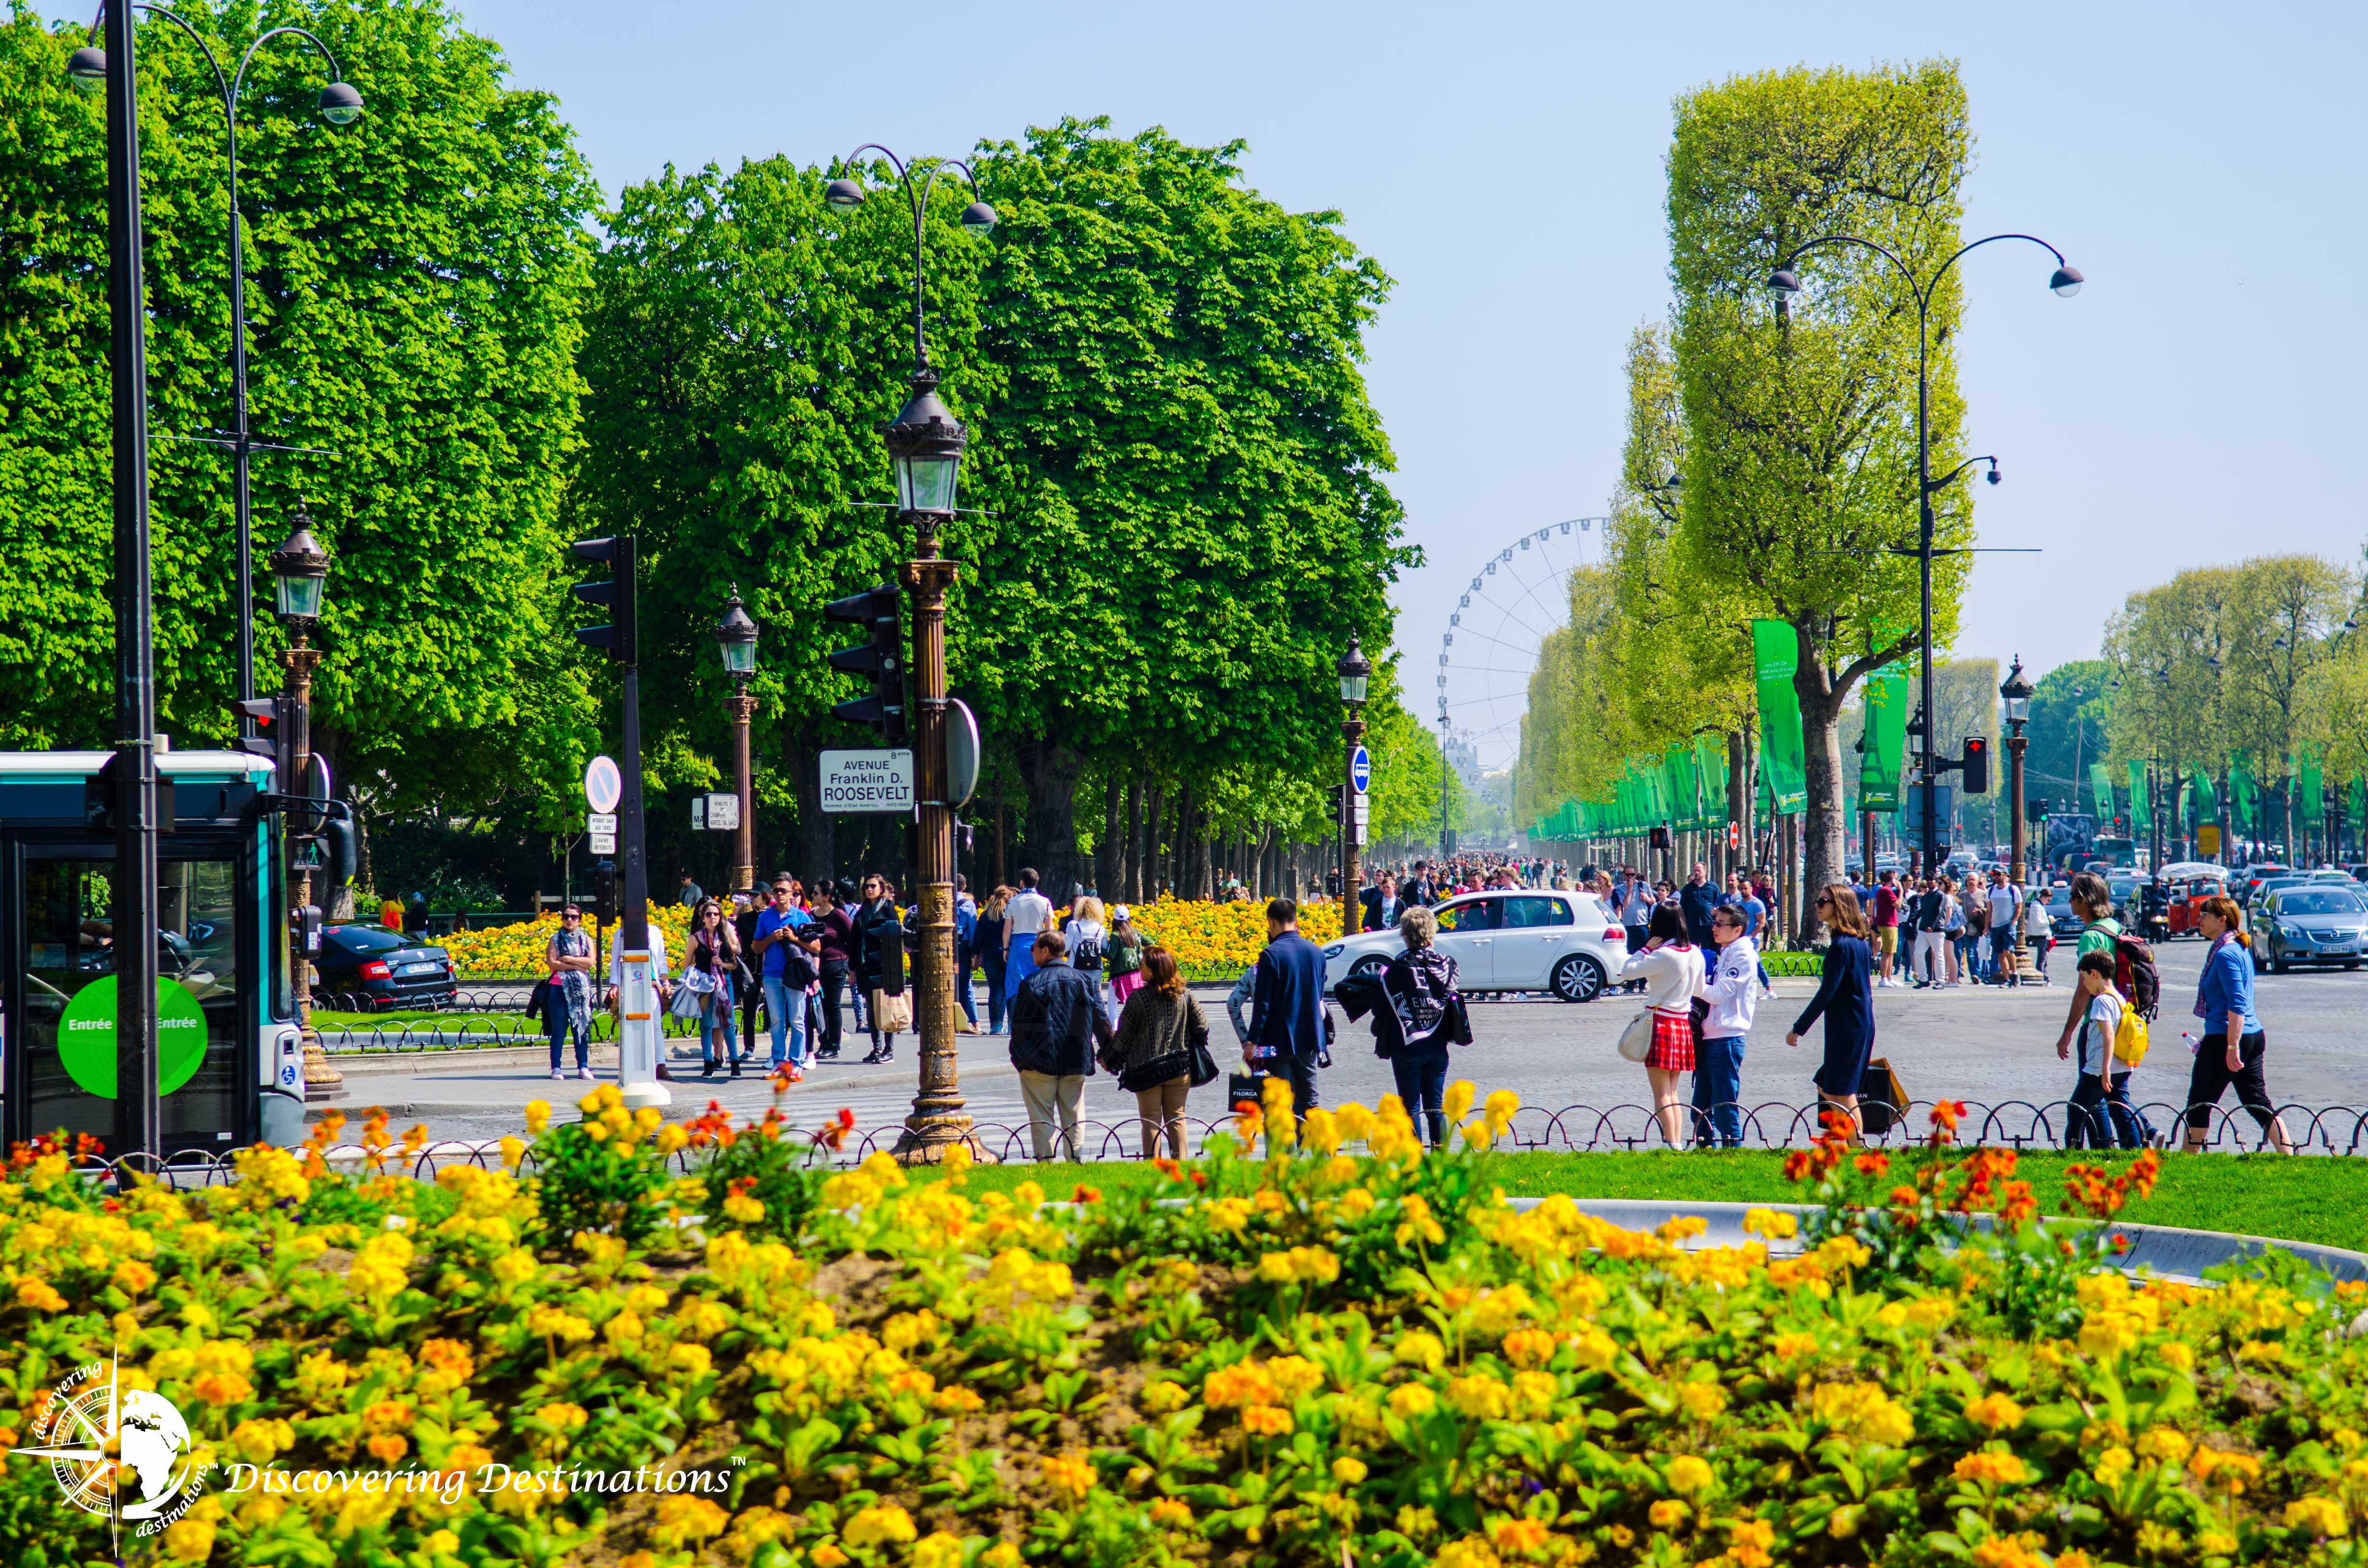 view of Garden des Tuileries